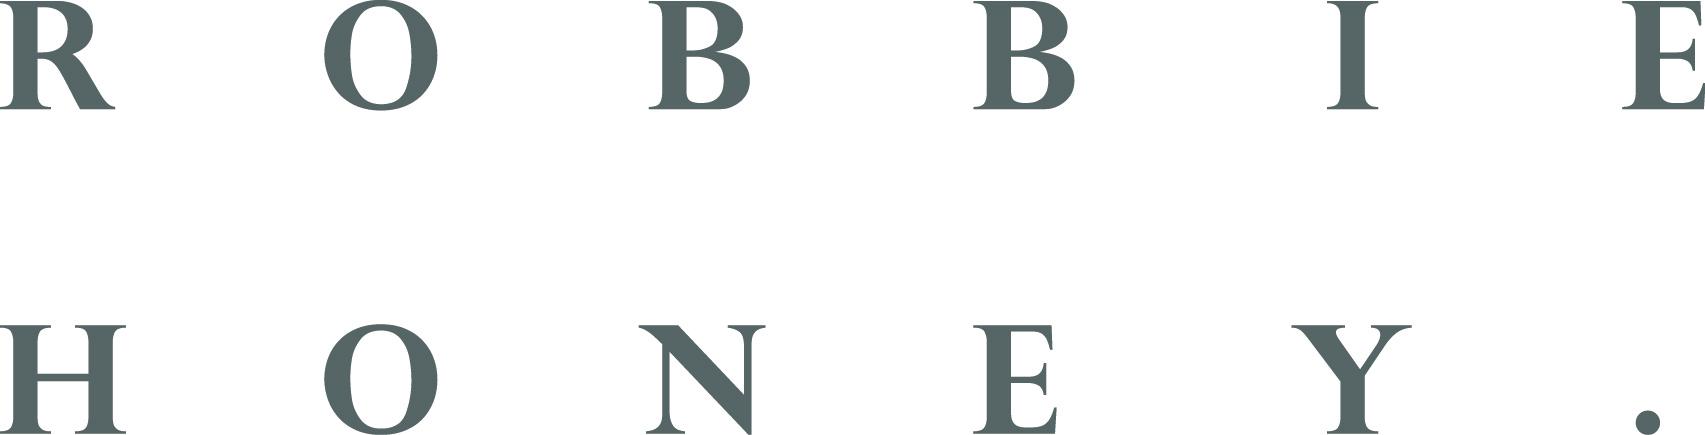 Robbie Honey _logo.jpeg